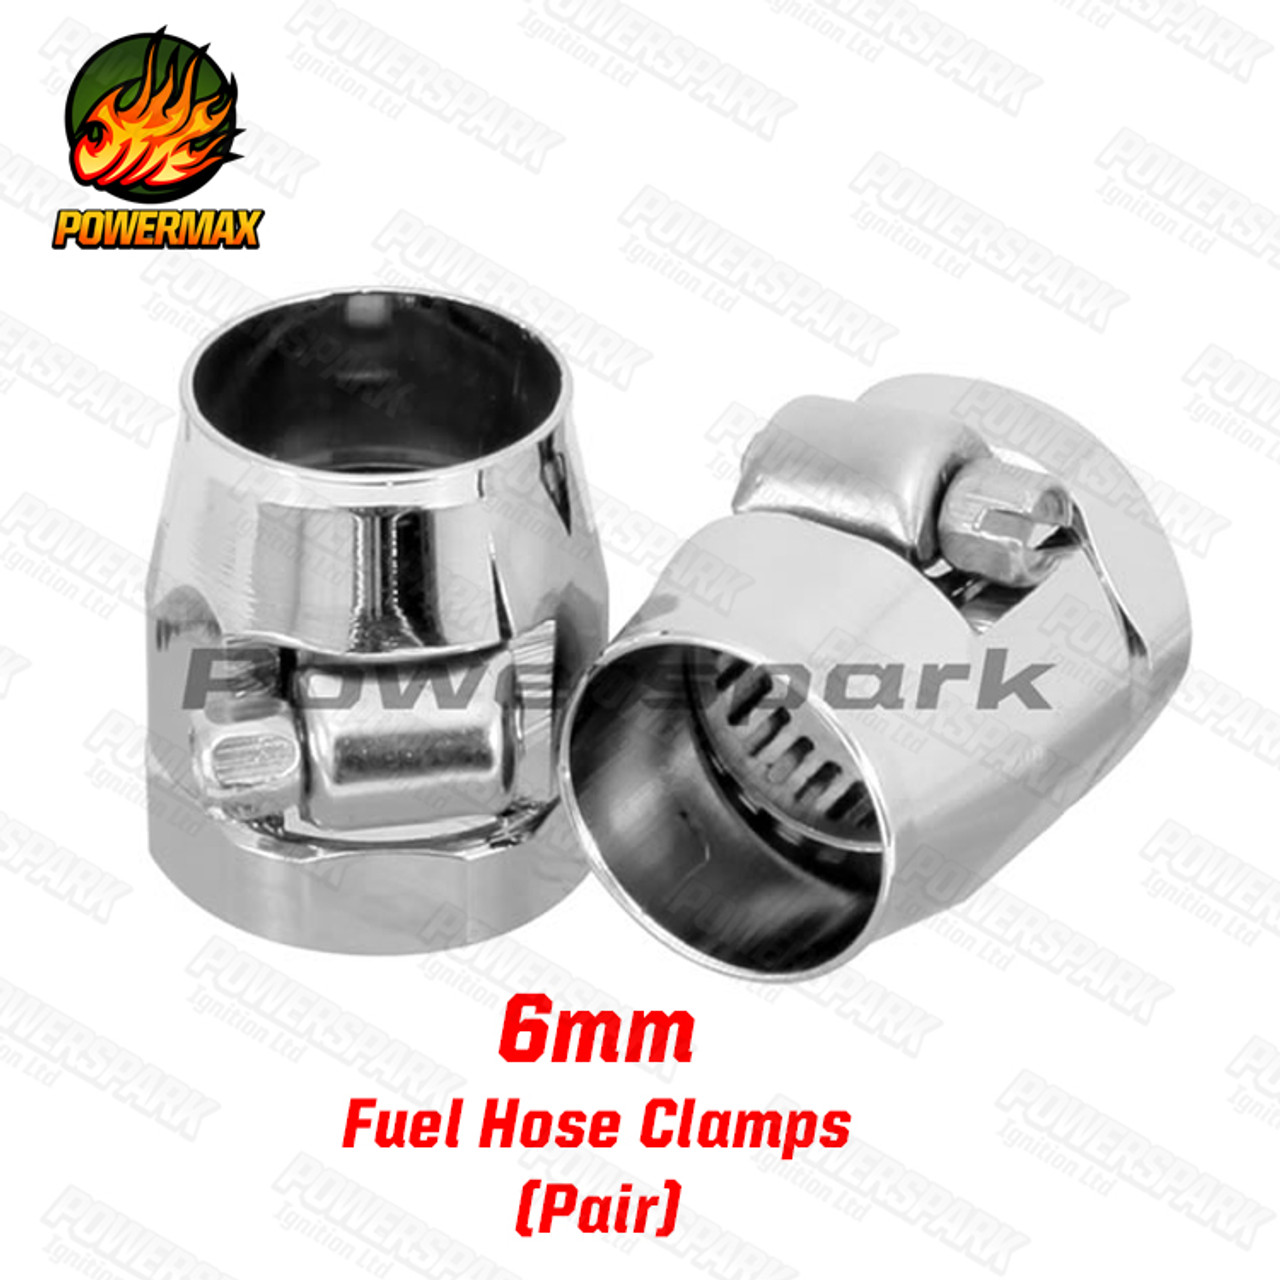 Pair of Powermax Magna Fuel Hose Clamps 6mm